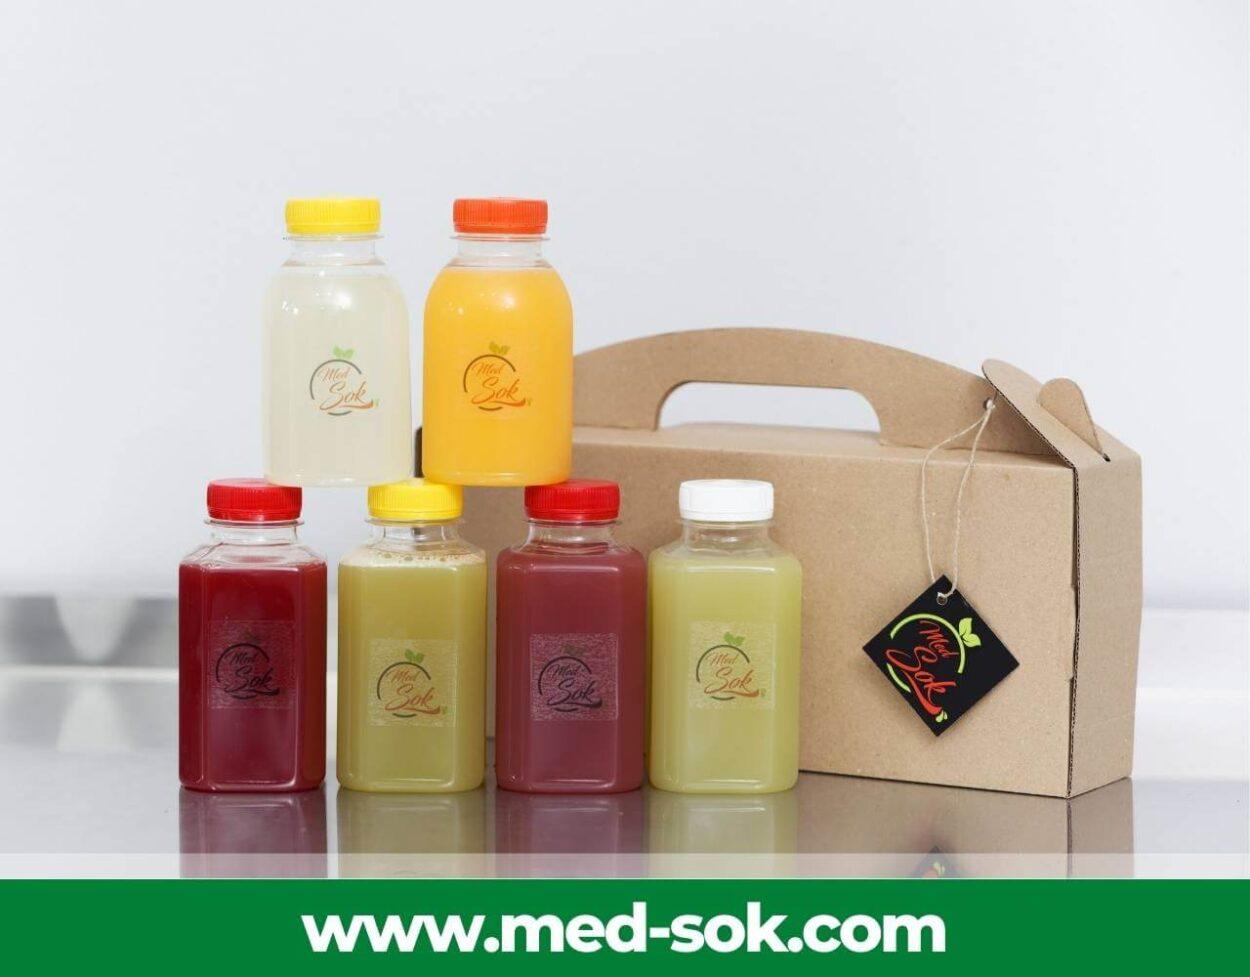 DepilConcept detox organizma prirodnim hladno cedjenim sokovima Med Sok – iskustva i preporuke